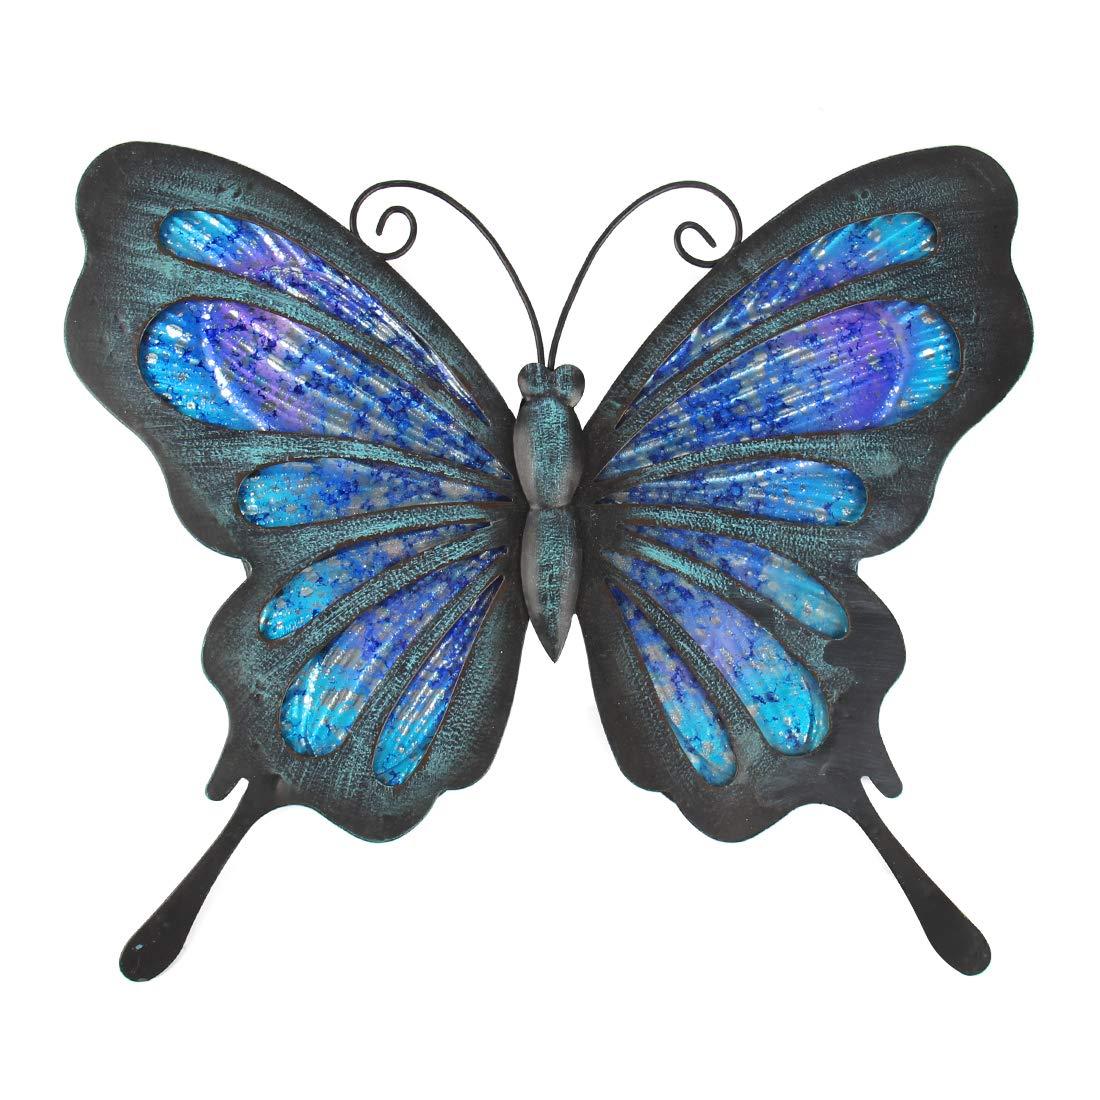 HONGLAND Metal Butterfly Wall Decor Outdoor Indoor Art Sculpture Hanging Glass Decorations Blue for Home Garden Bedroom